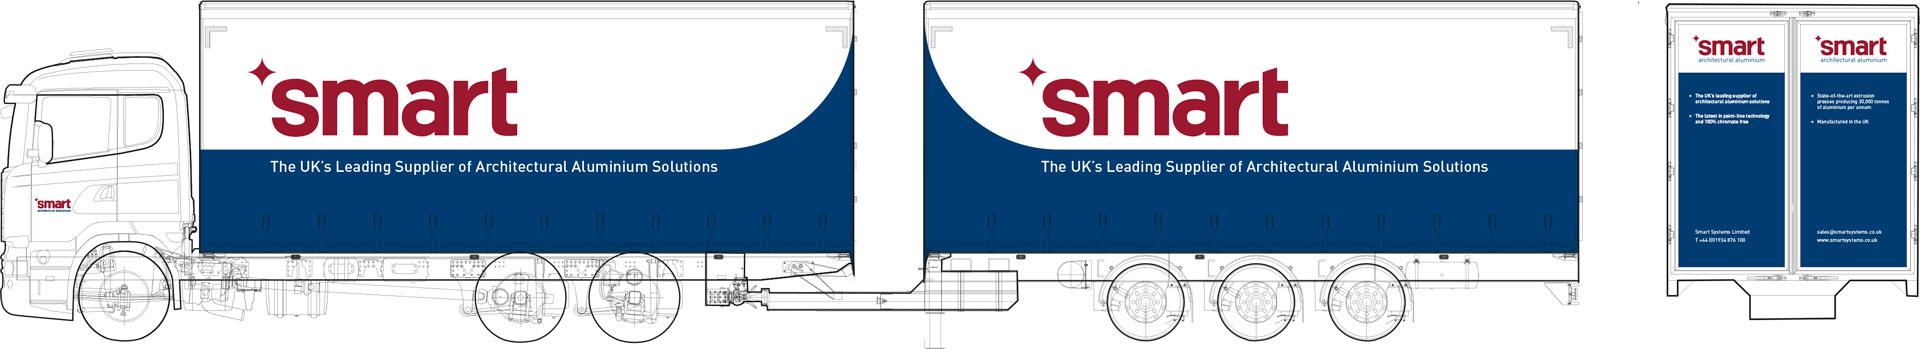 smart-livery